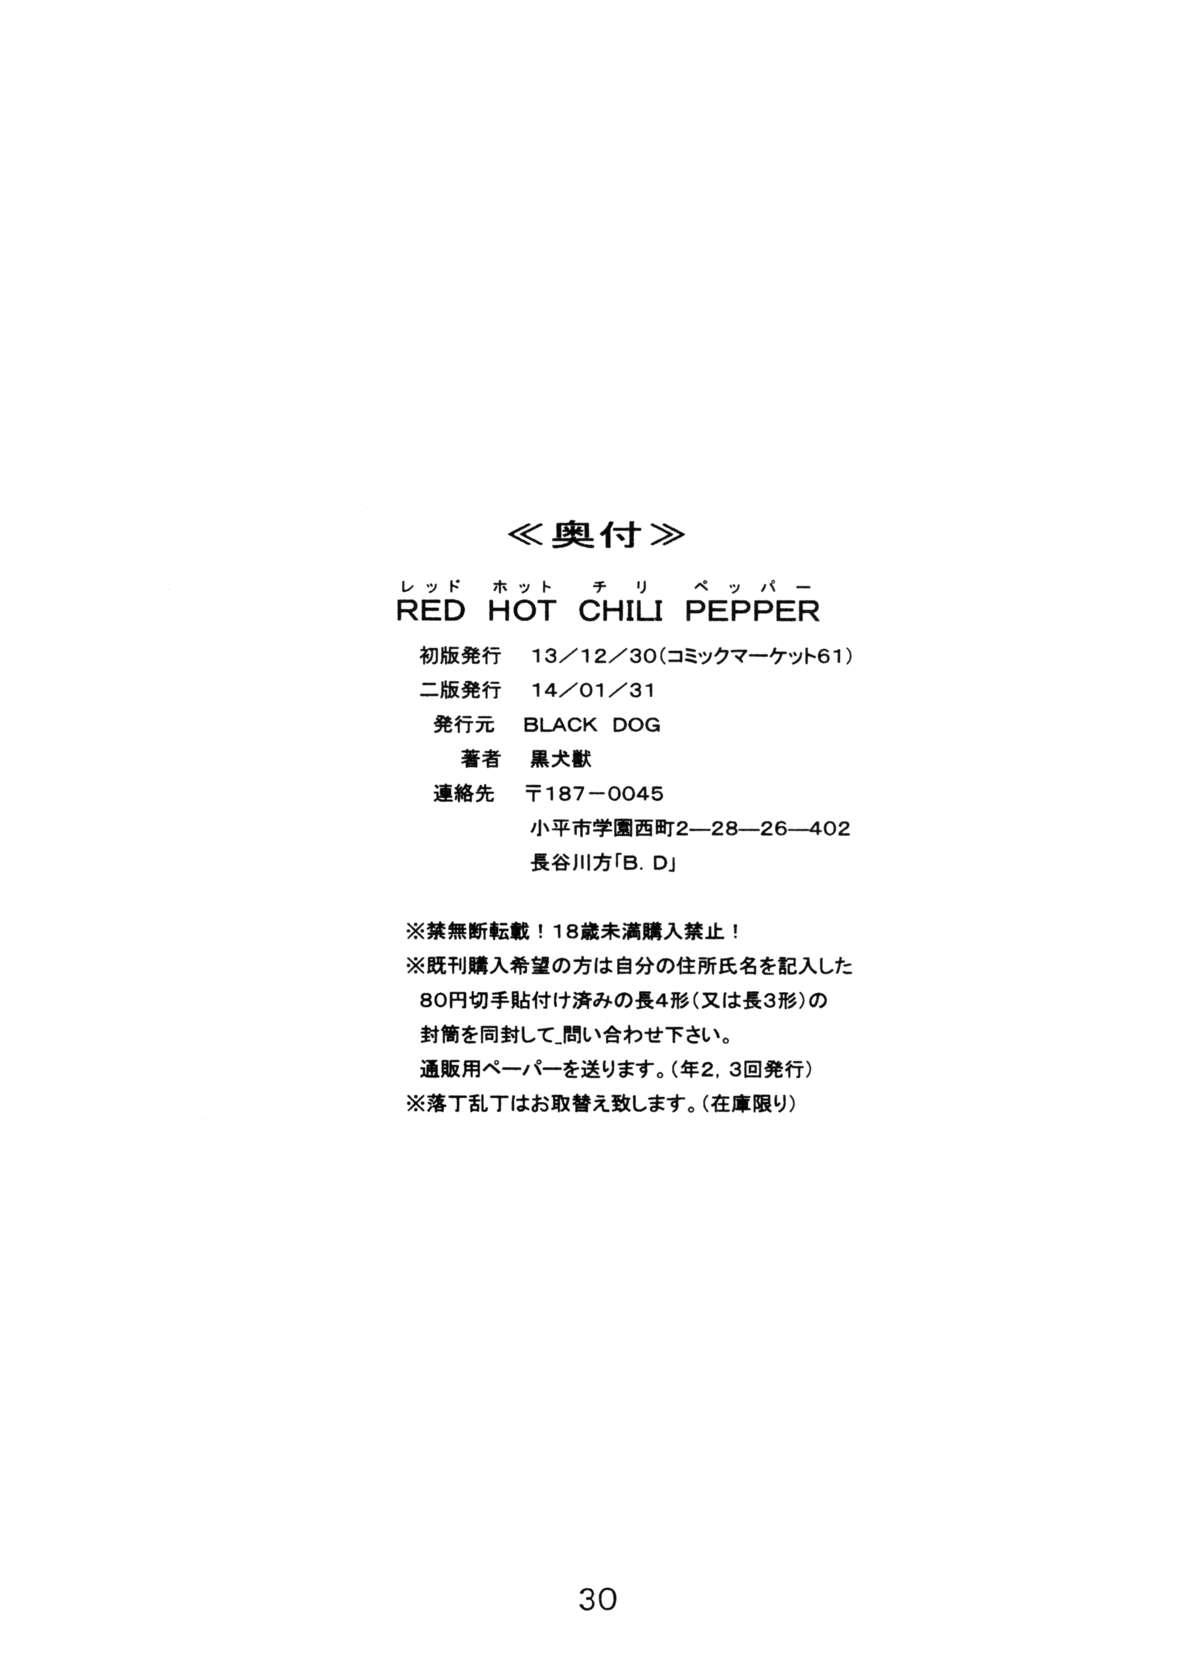 Red Hot Chili Pepper 28